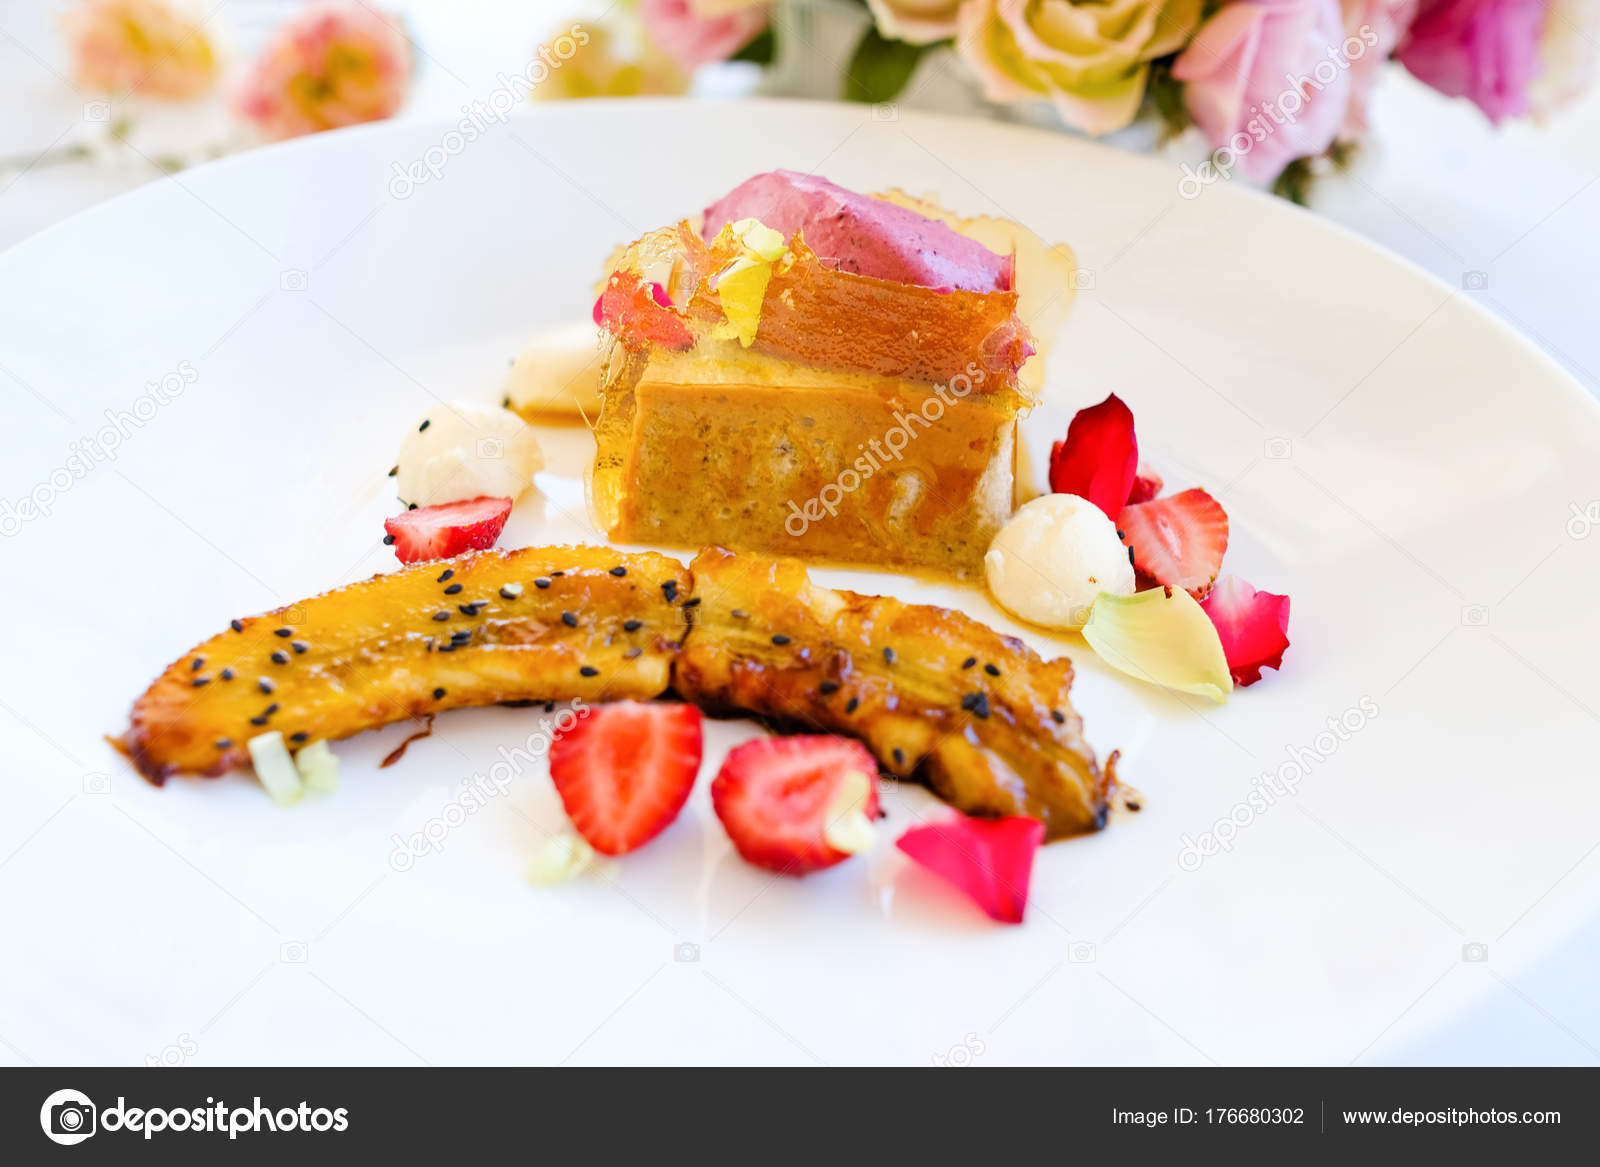 Receita De Sobremesa De Confeitaria Gourmet Fotografias De Stock